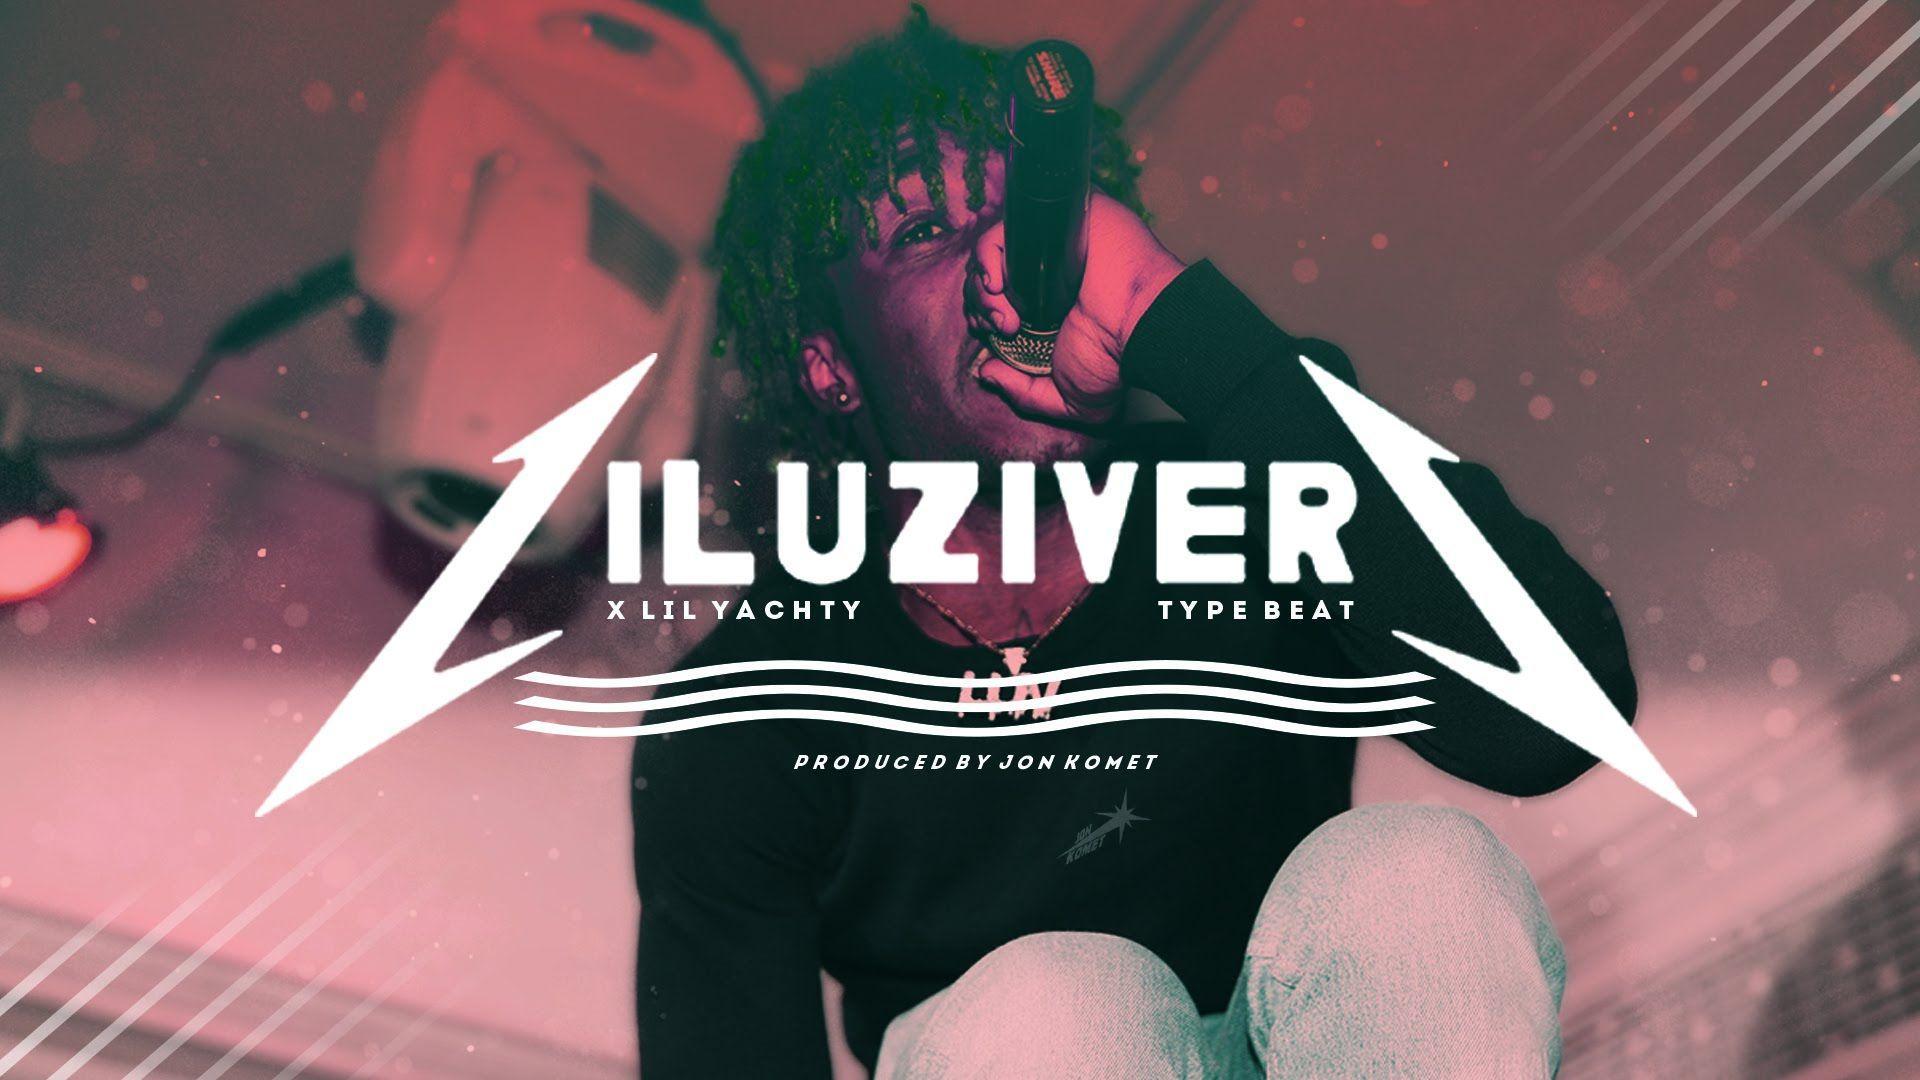 Lil Uzi Vert Wallpapers Top Free Lil Uzi Vert Backgrounds